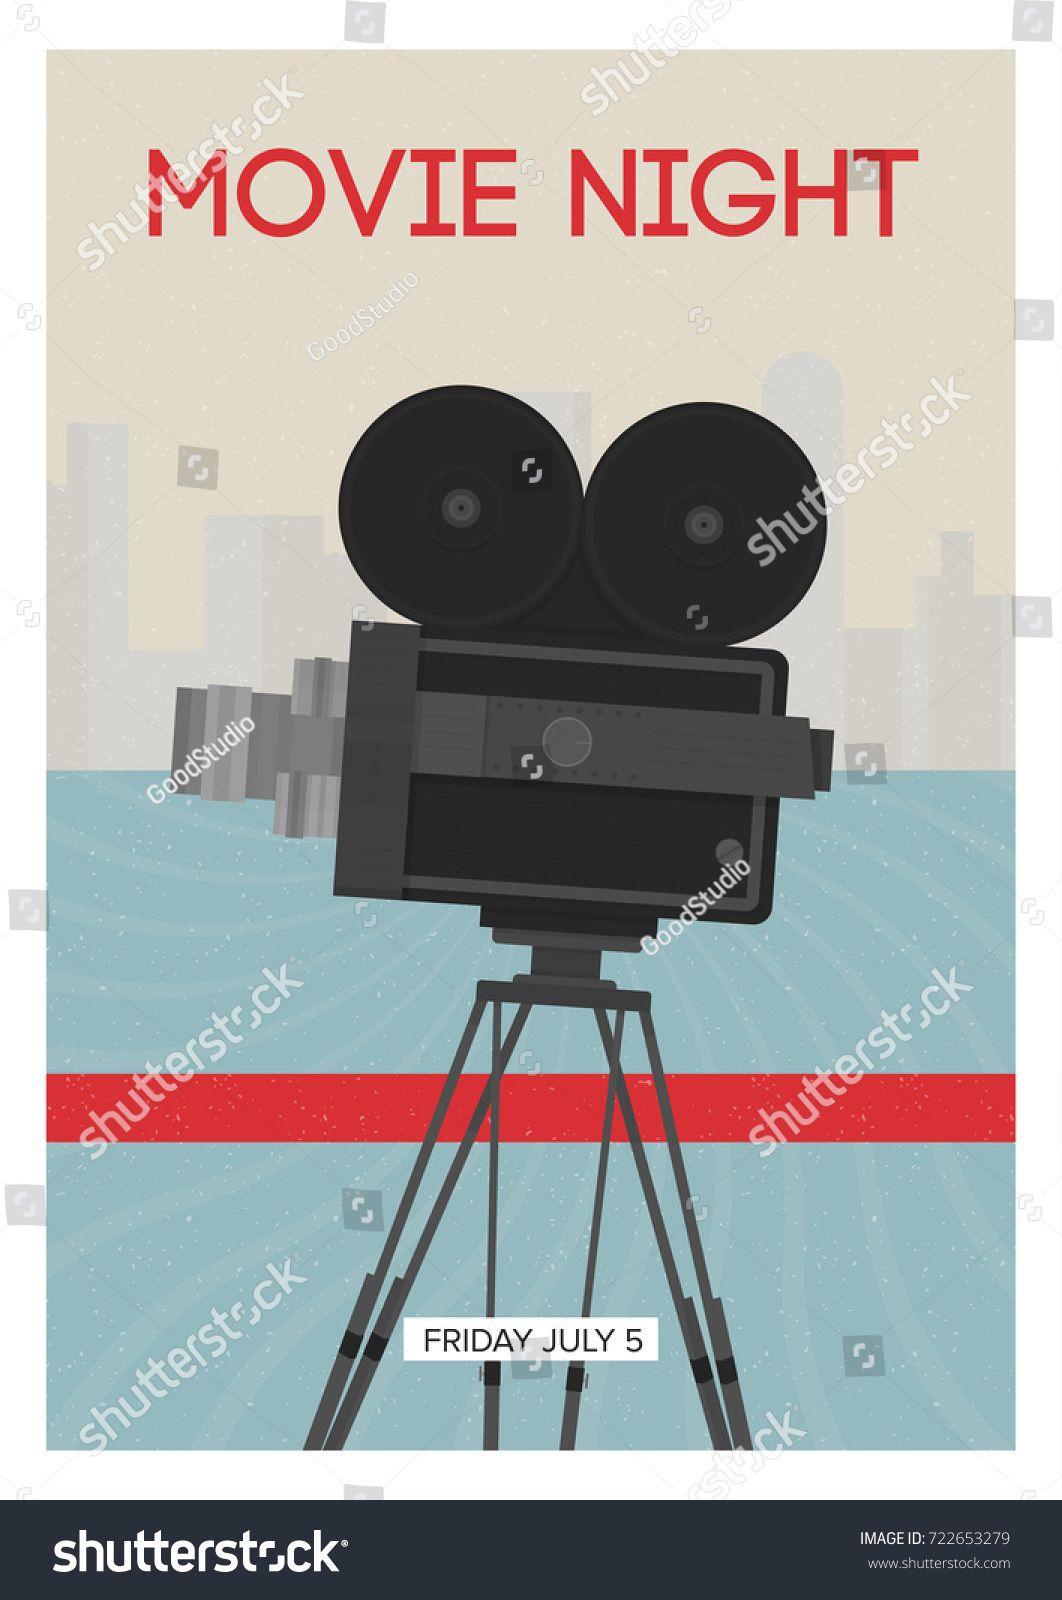 008 Wondrou Movie Night Flyer Template High Resolution  Templates Free Microsoft WordFull